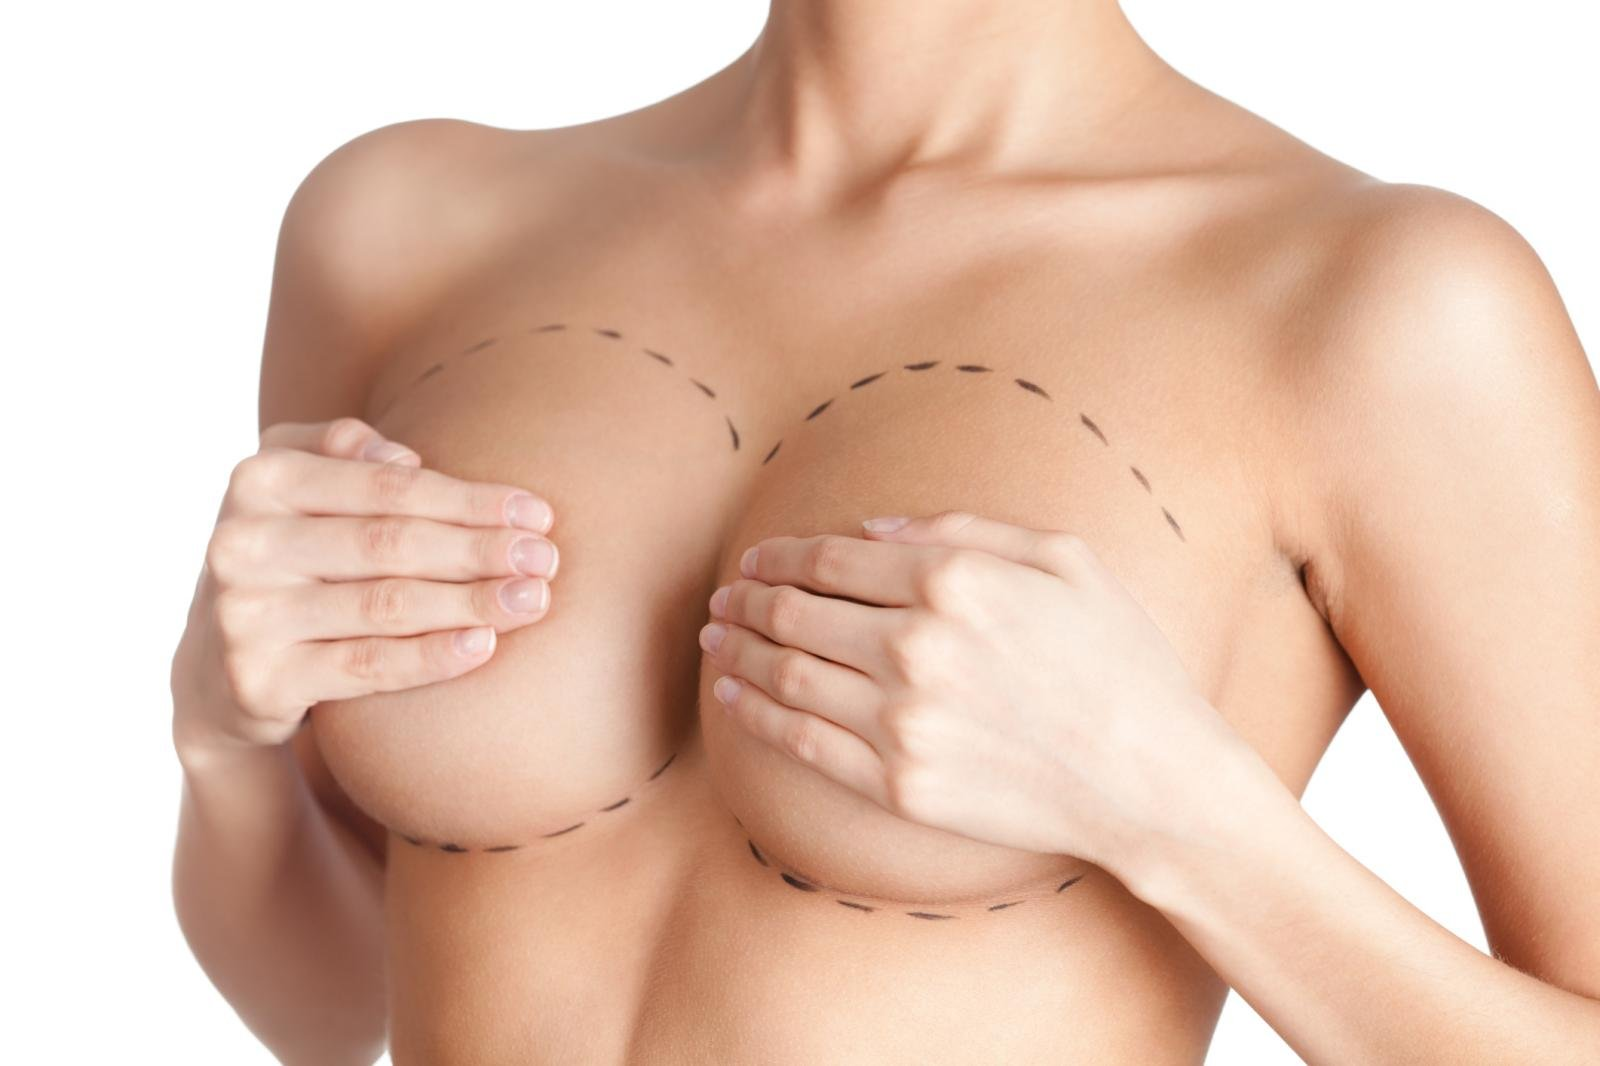 Маммопластика груди, особенности операции